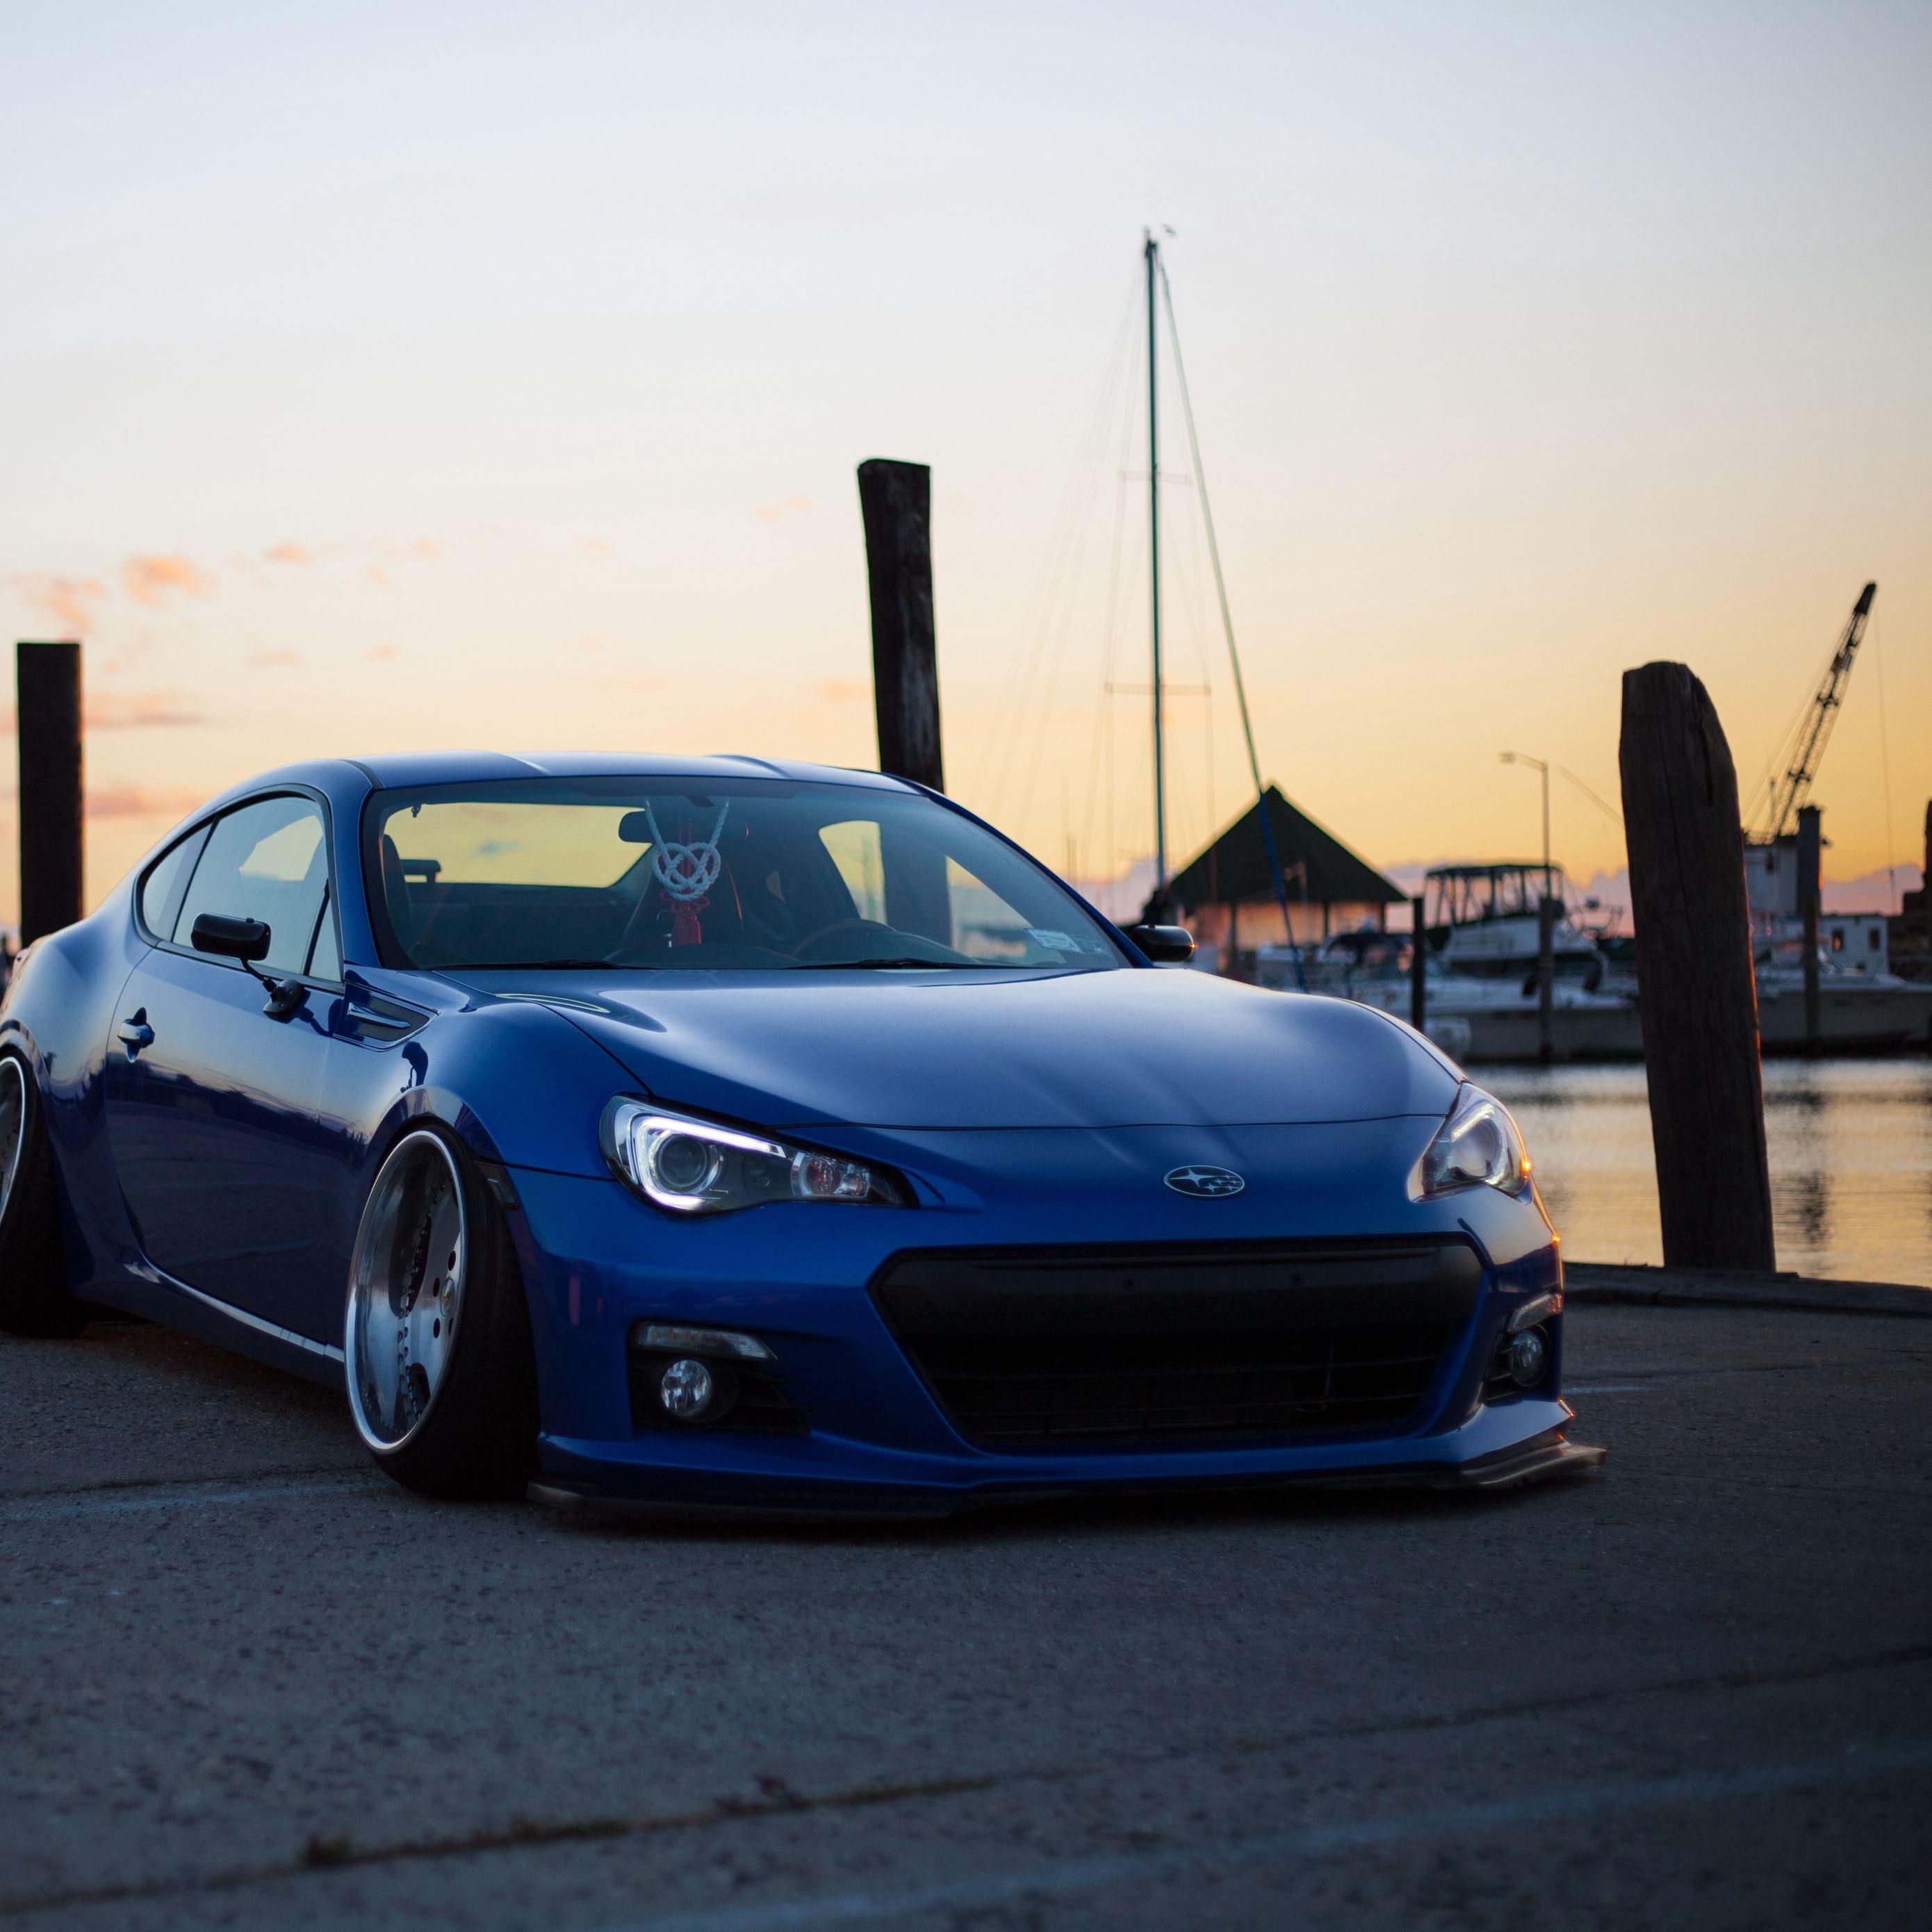 2780x2780 Wallpaper subaru, side view, blue, sports car, tuning